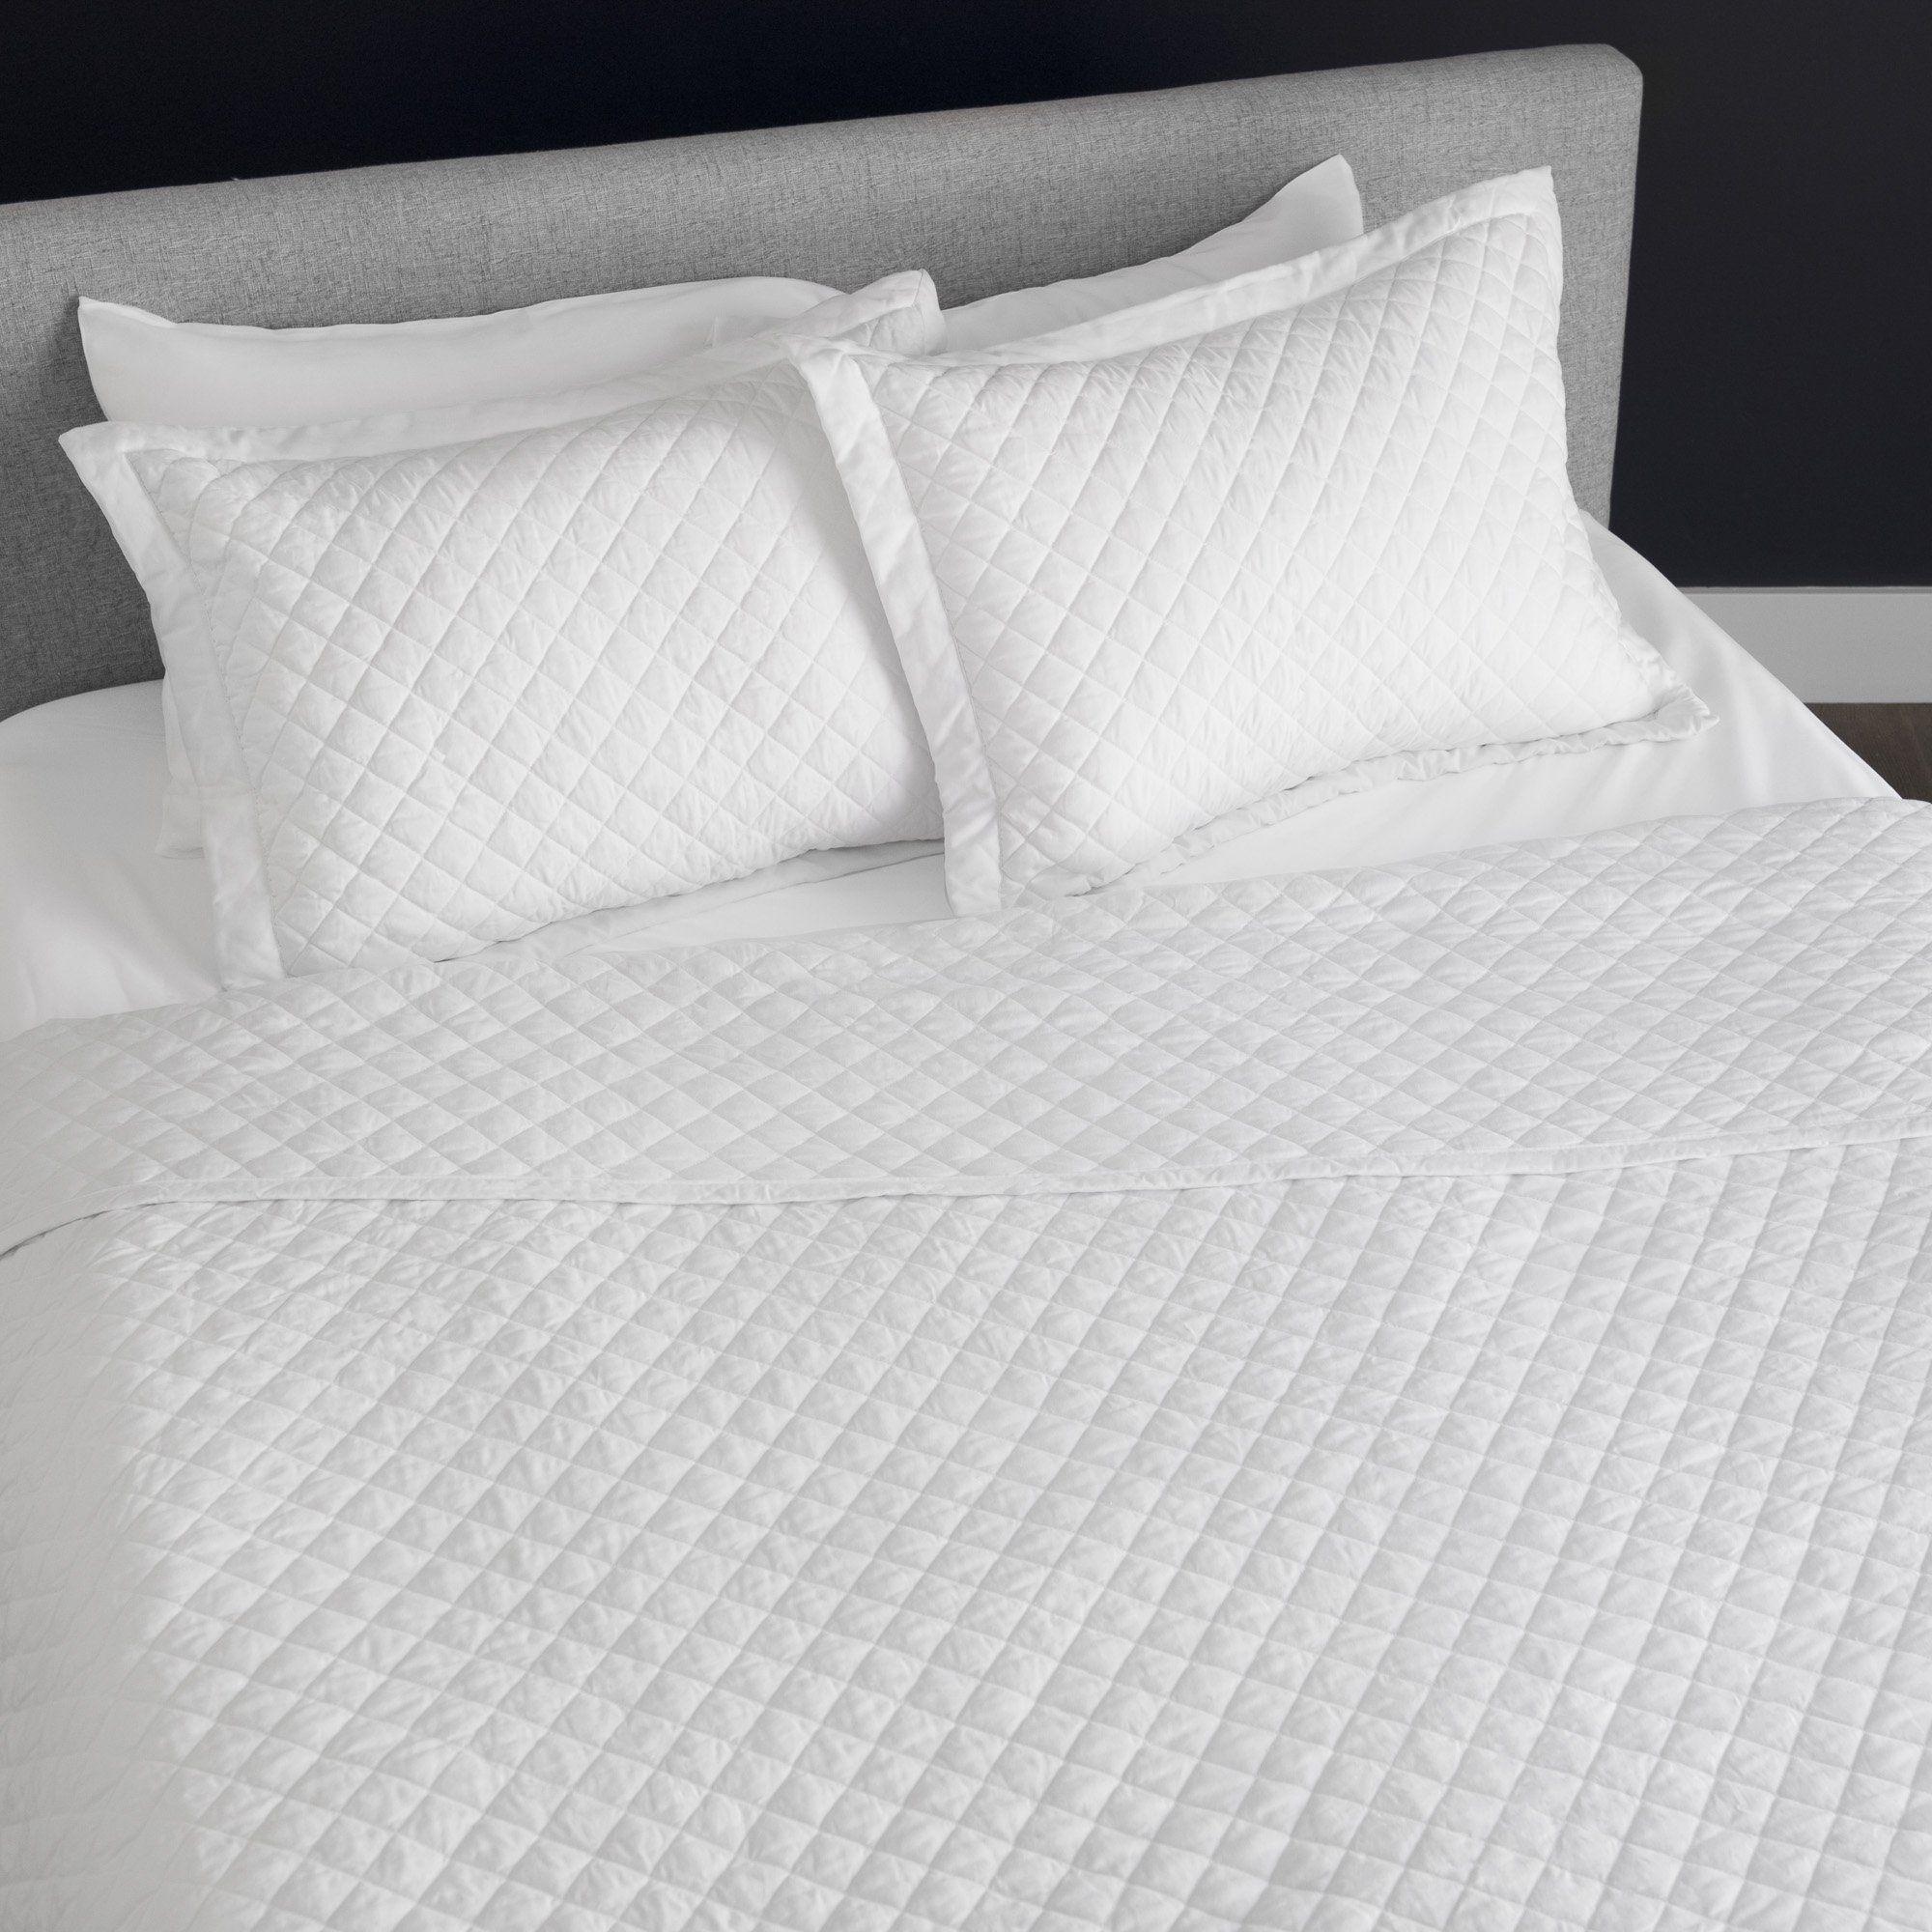 Diamond Blanket/Coverlet Adams homes, King comforter